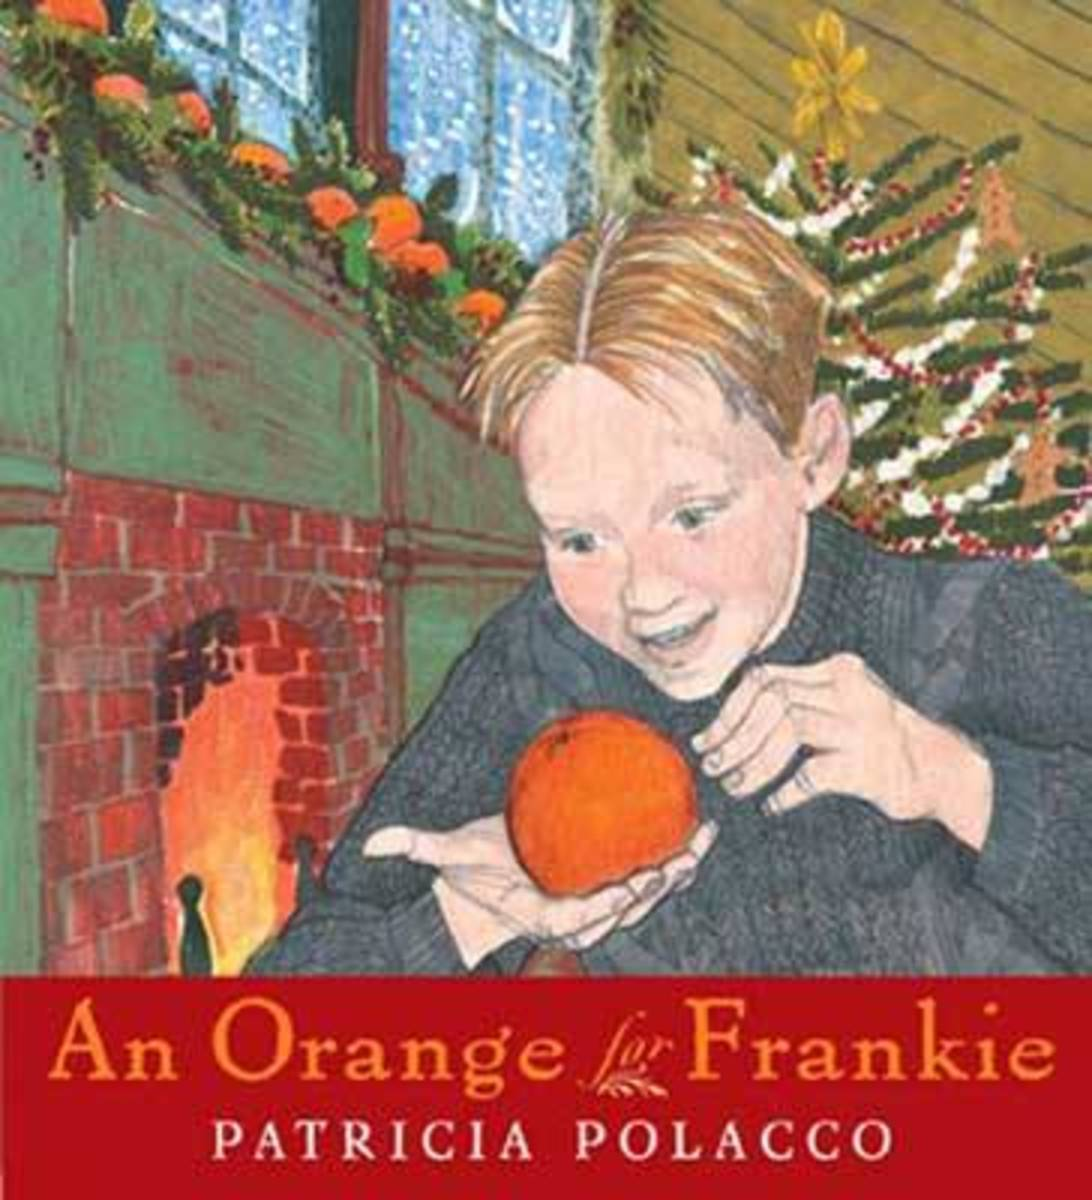 An Orange for Frankie by Paticia Polacco